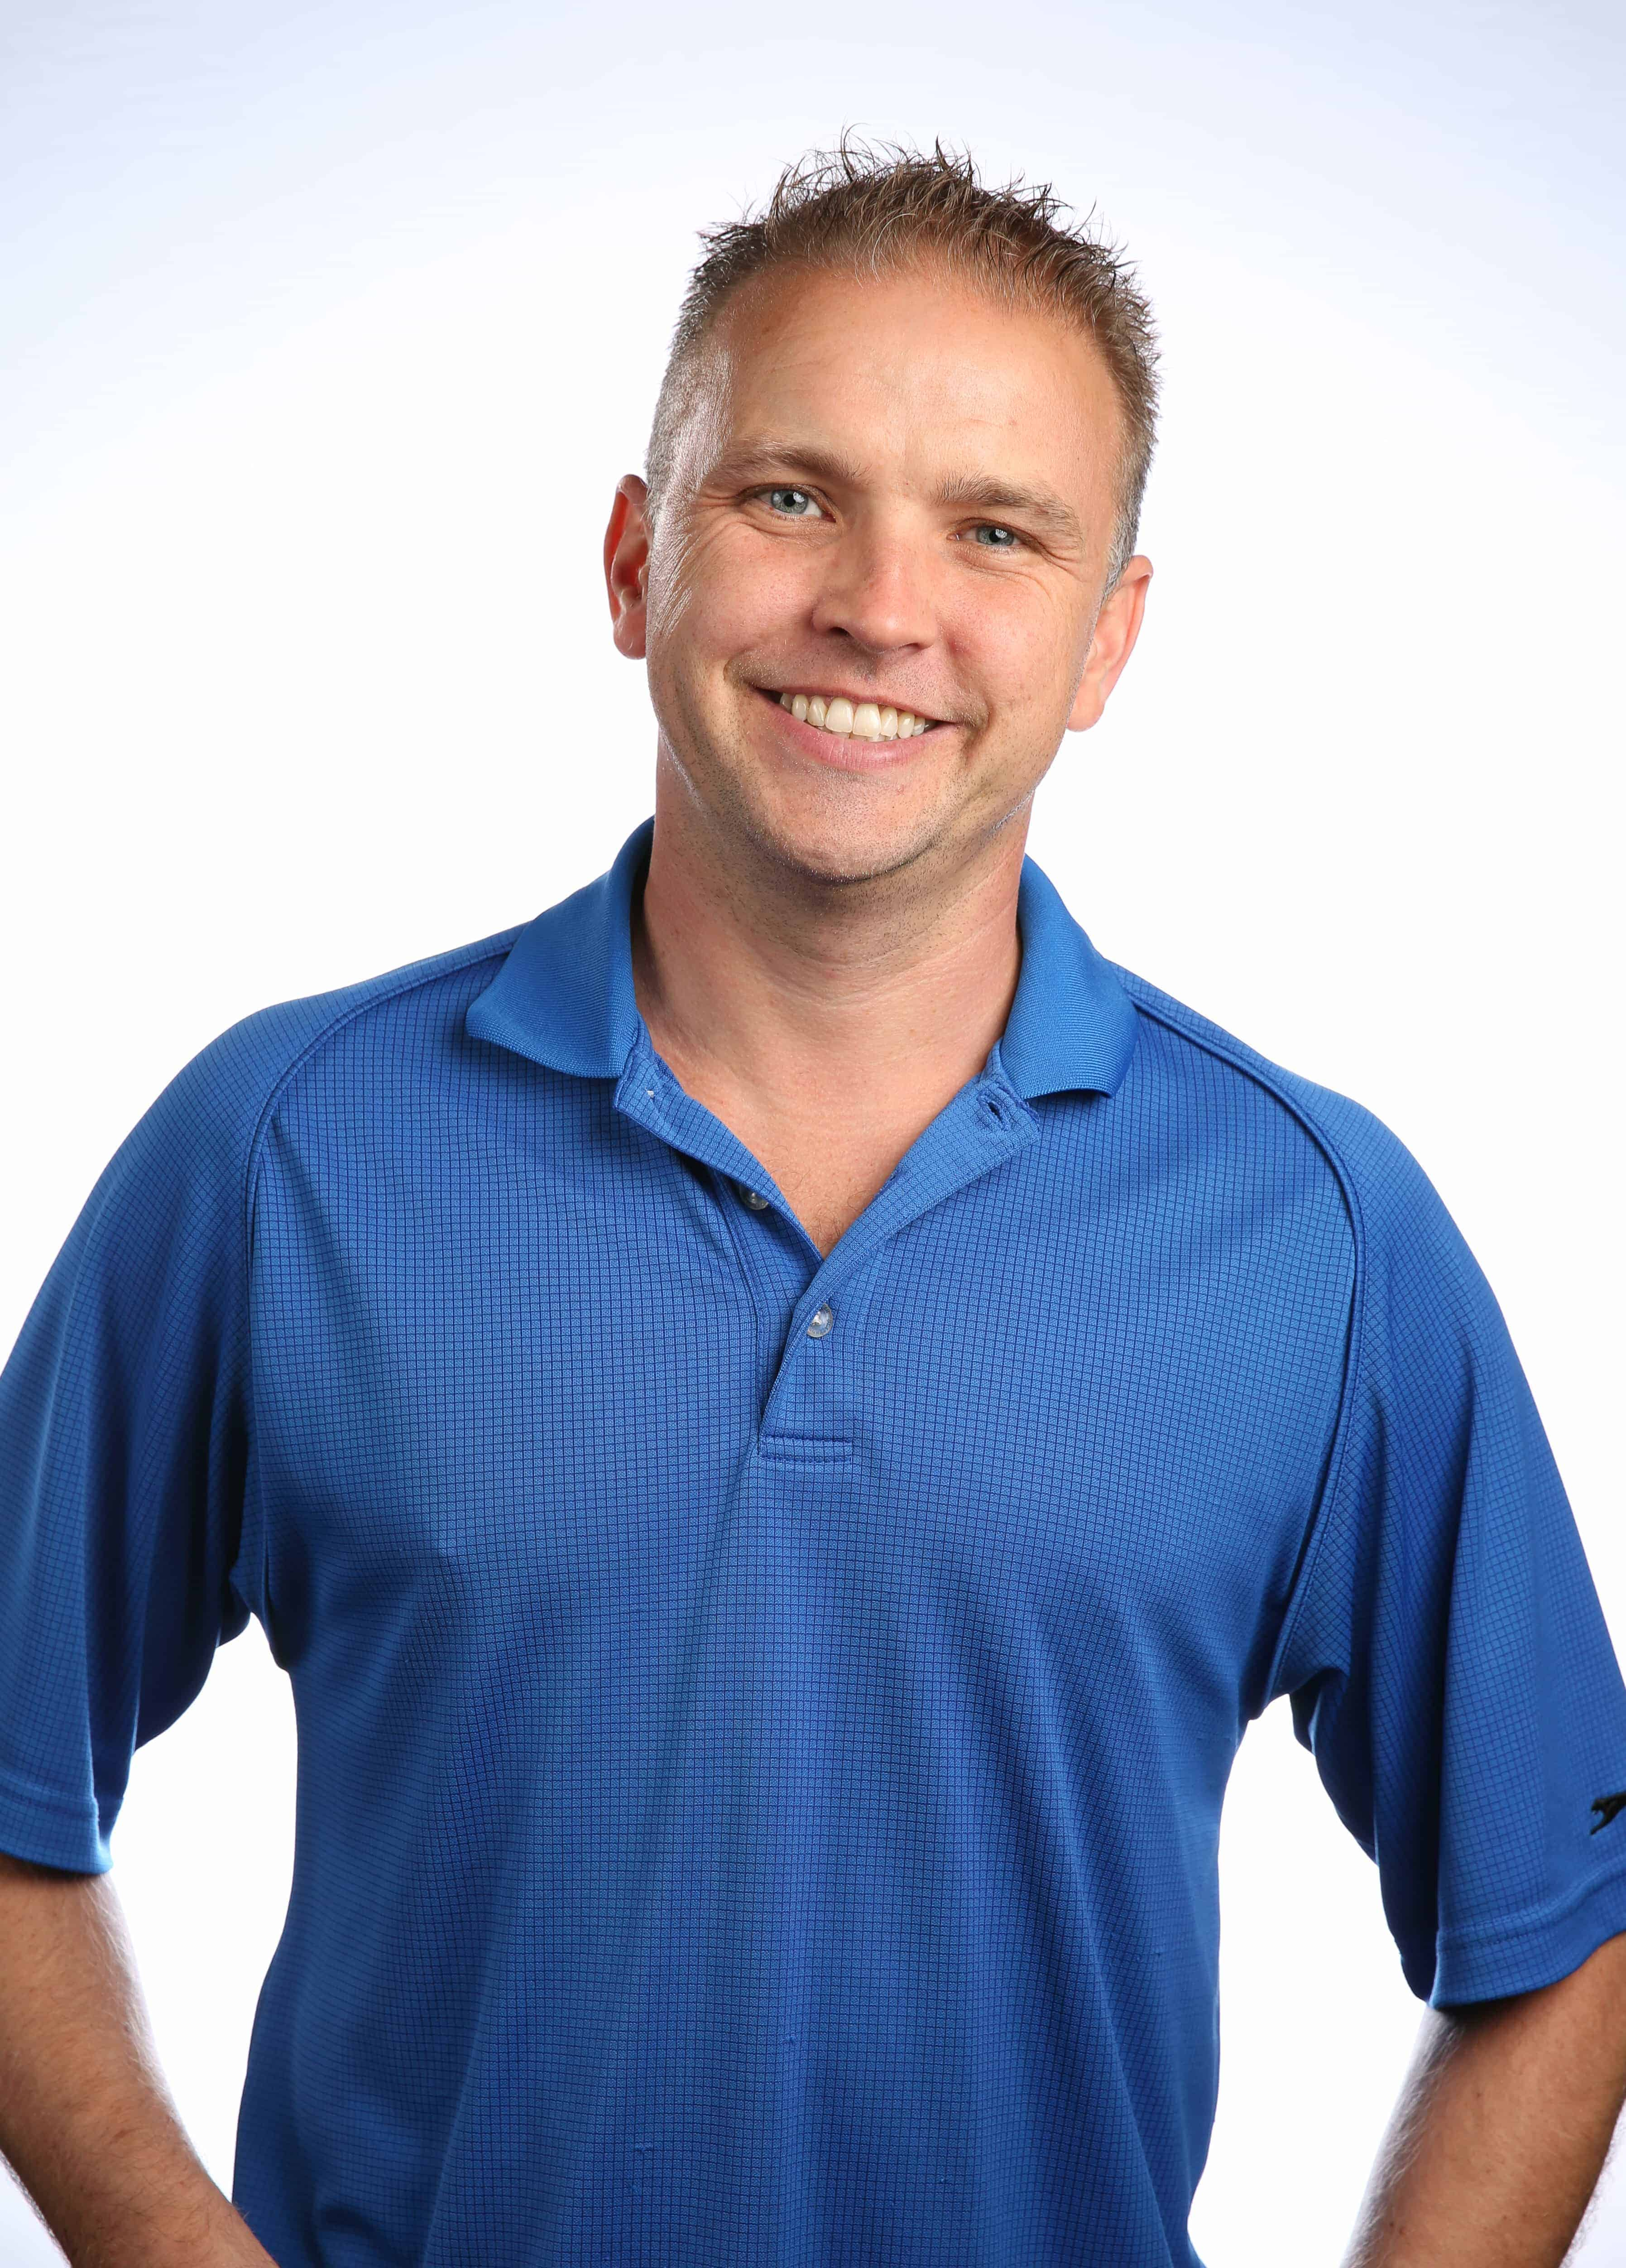 Andrew Daniels